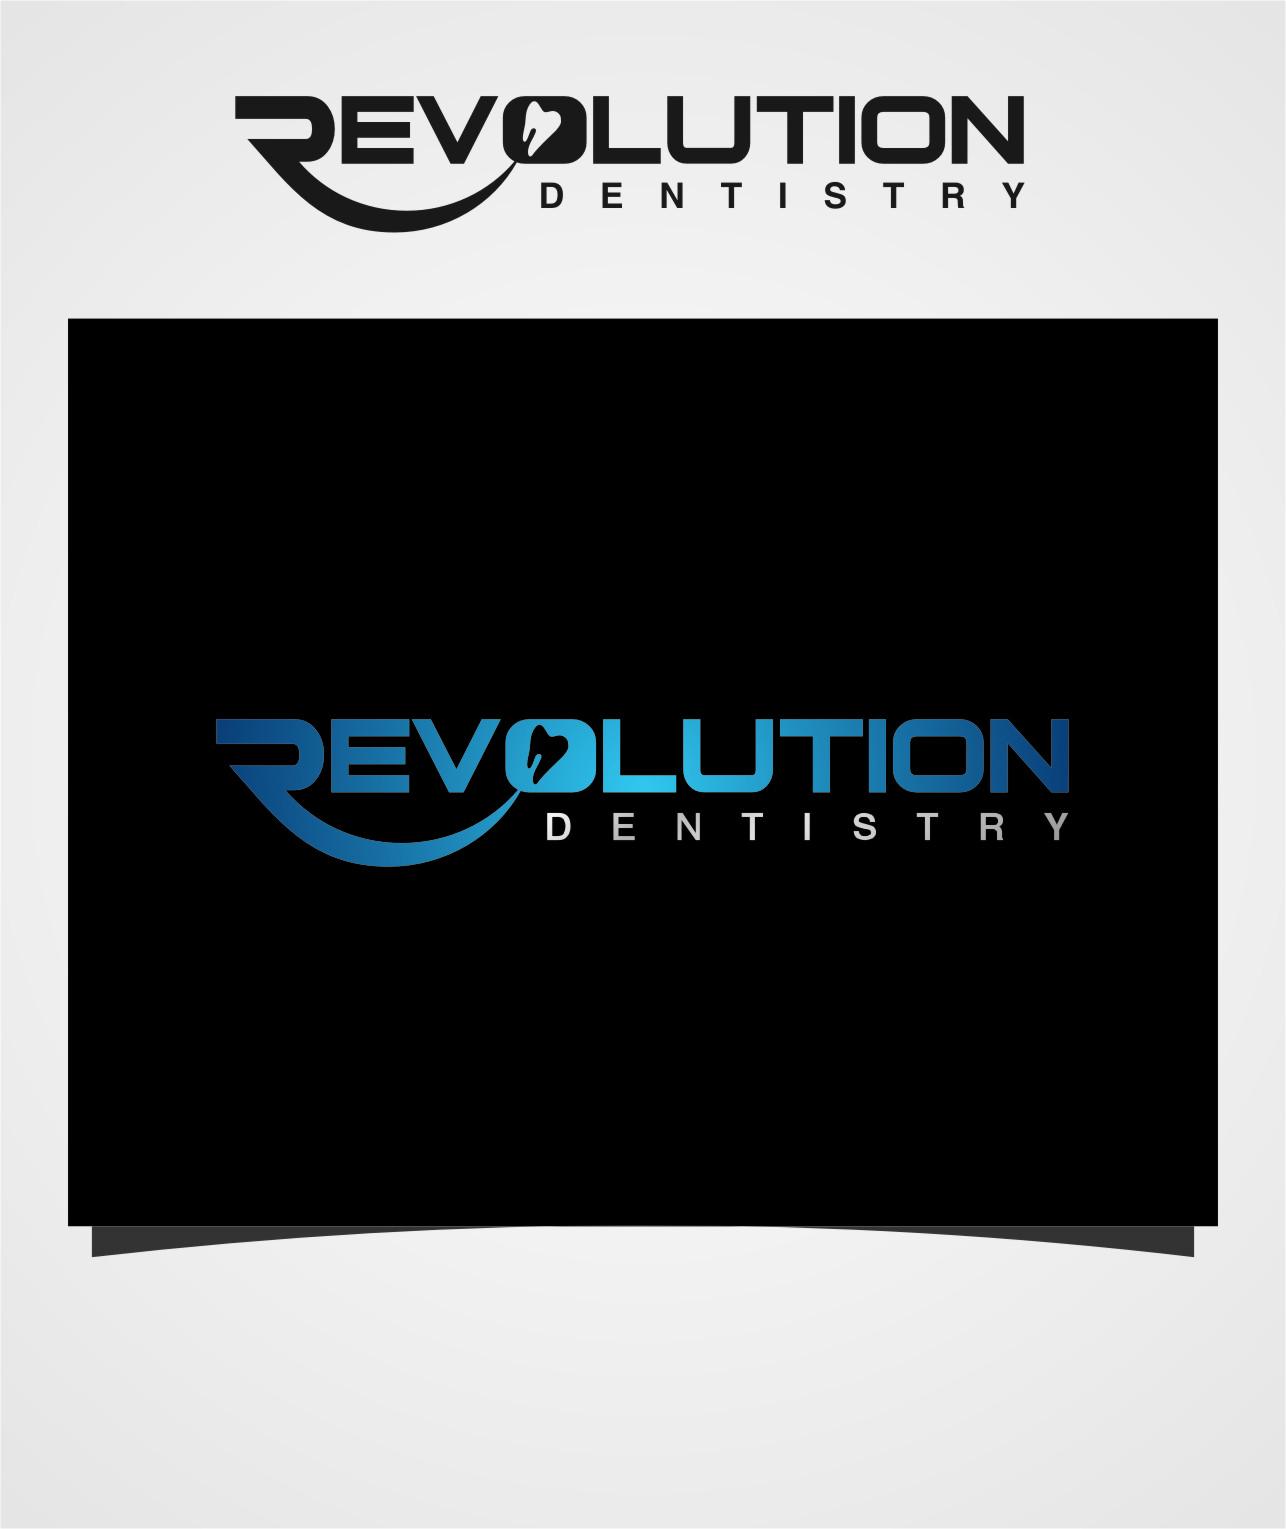 Logo Design by Ngepet_art - Entry No. 24 in the Logo Design Contest Artistic Logo Design for Revolution Dentistry.